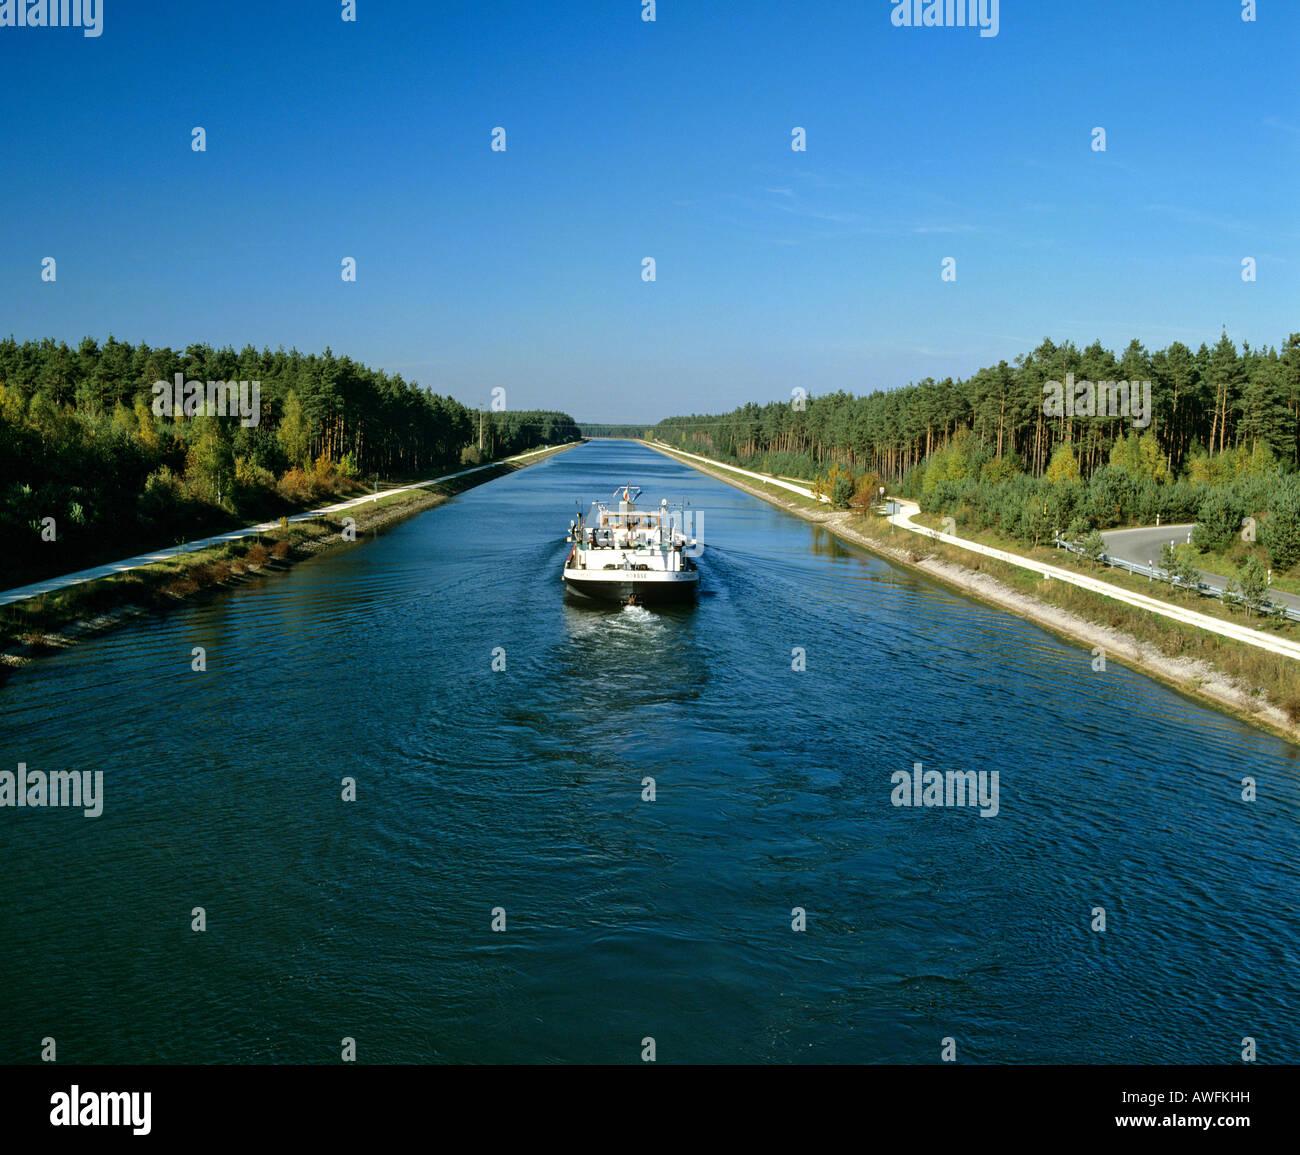 Boat on the Main-Danube-Canal near Nuremberg, Franconia, Bavaria, Germany, Europe Stock Photo